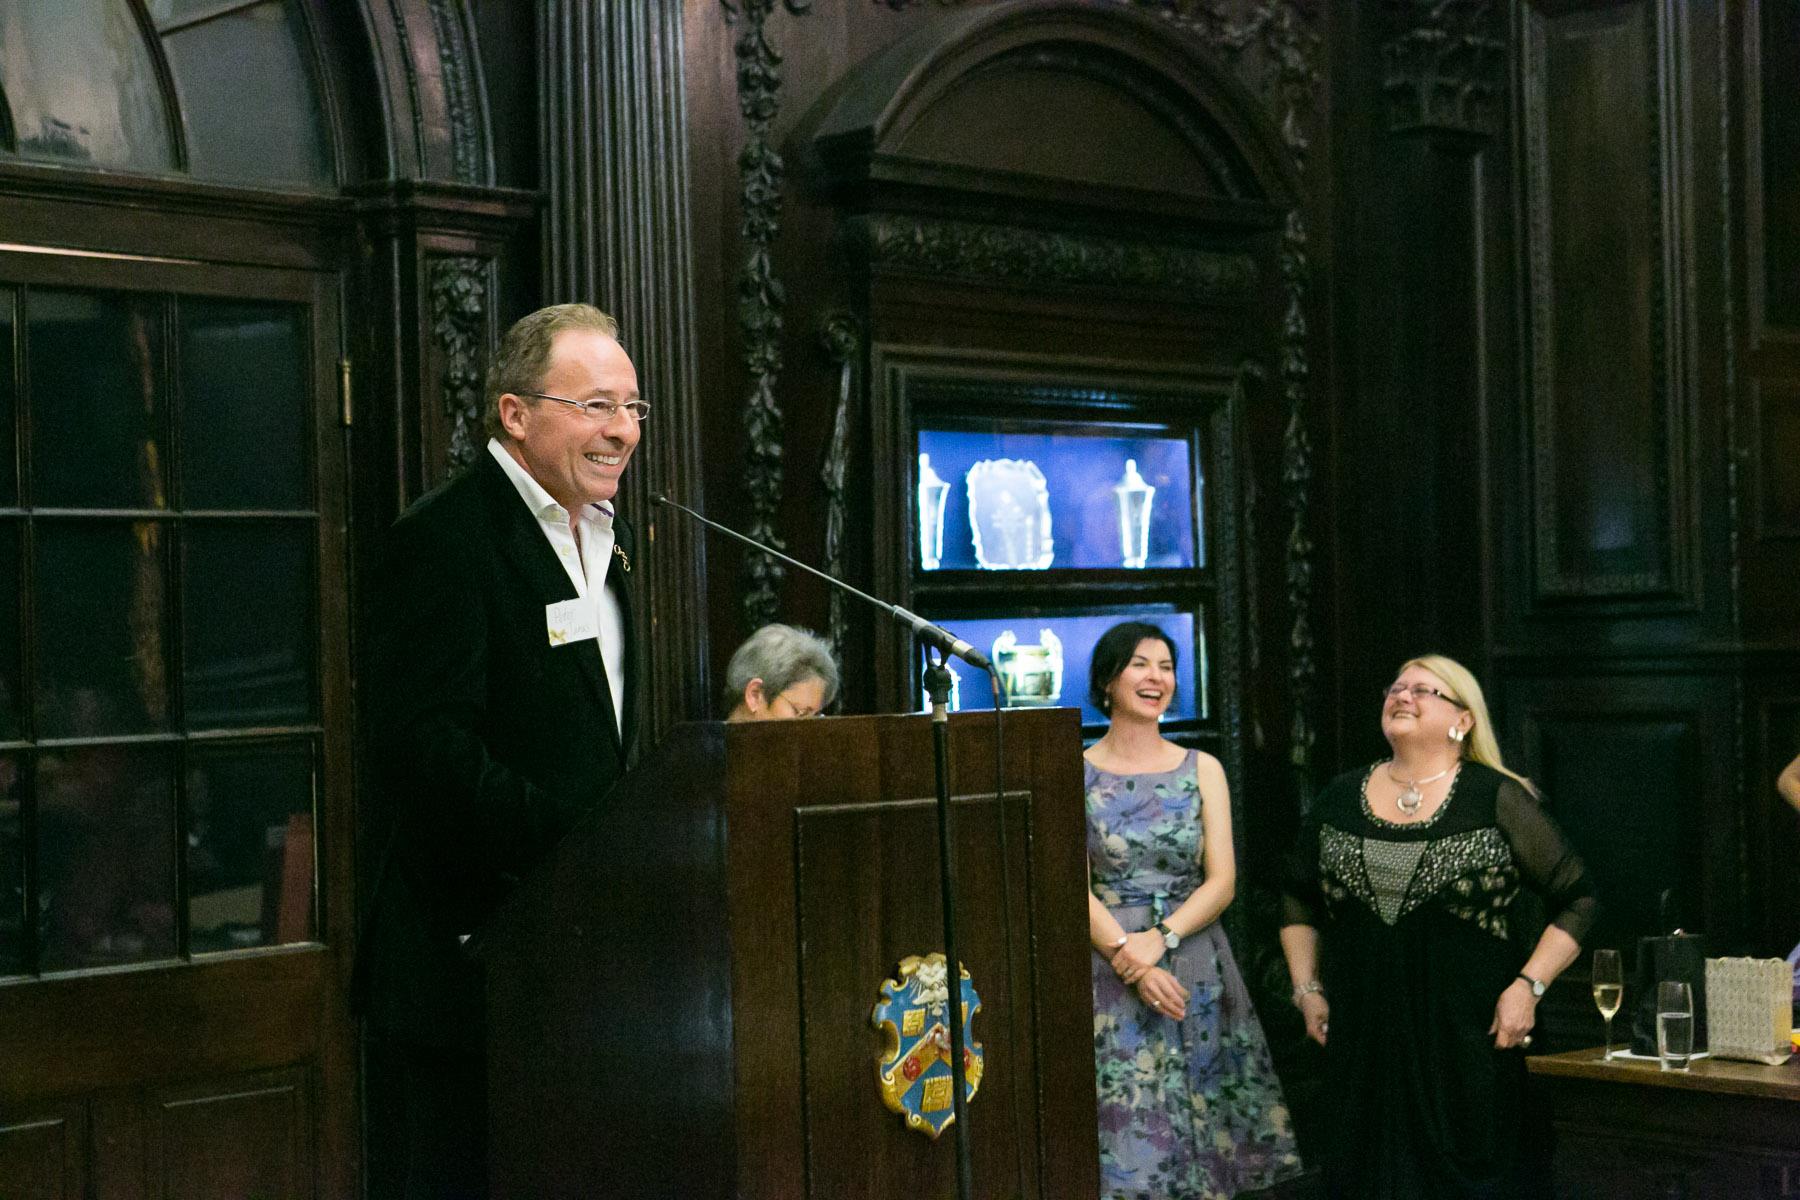 Peter James, Isobel Dixon, Carole Blake